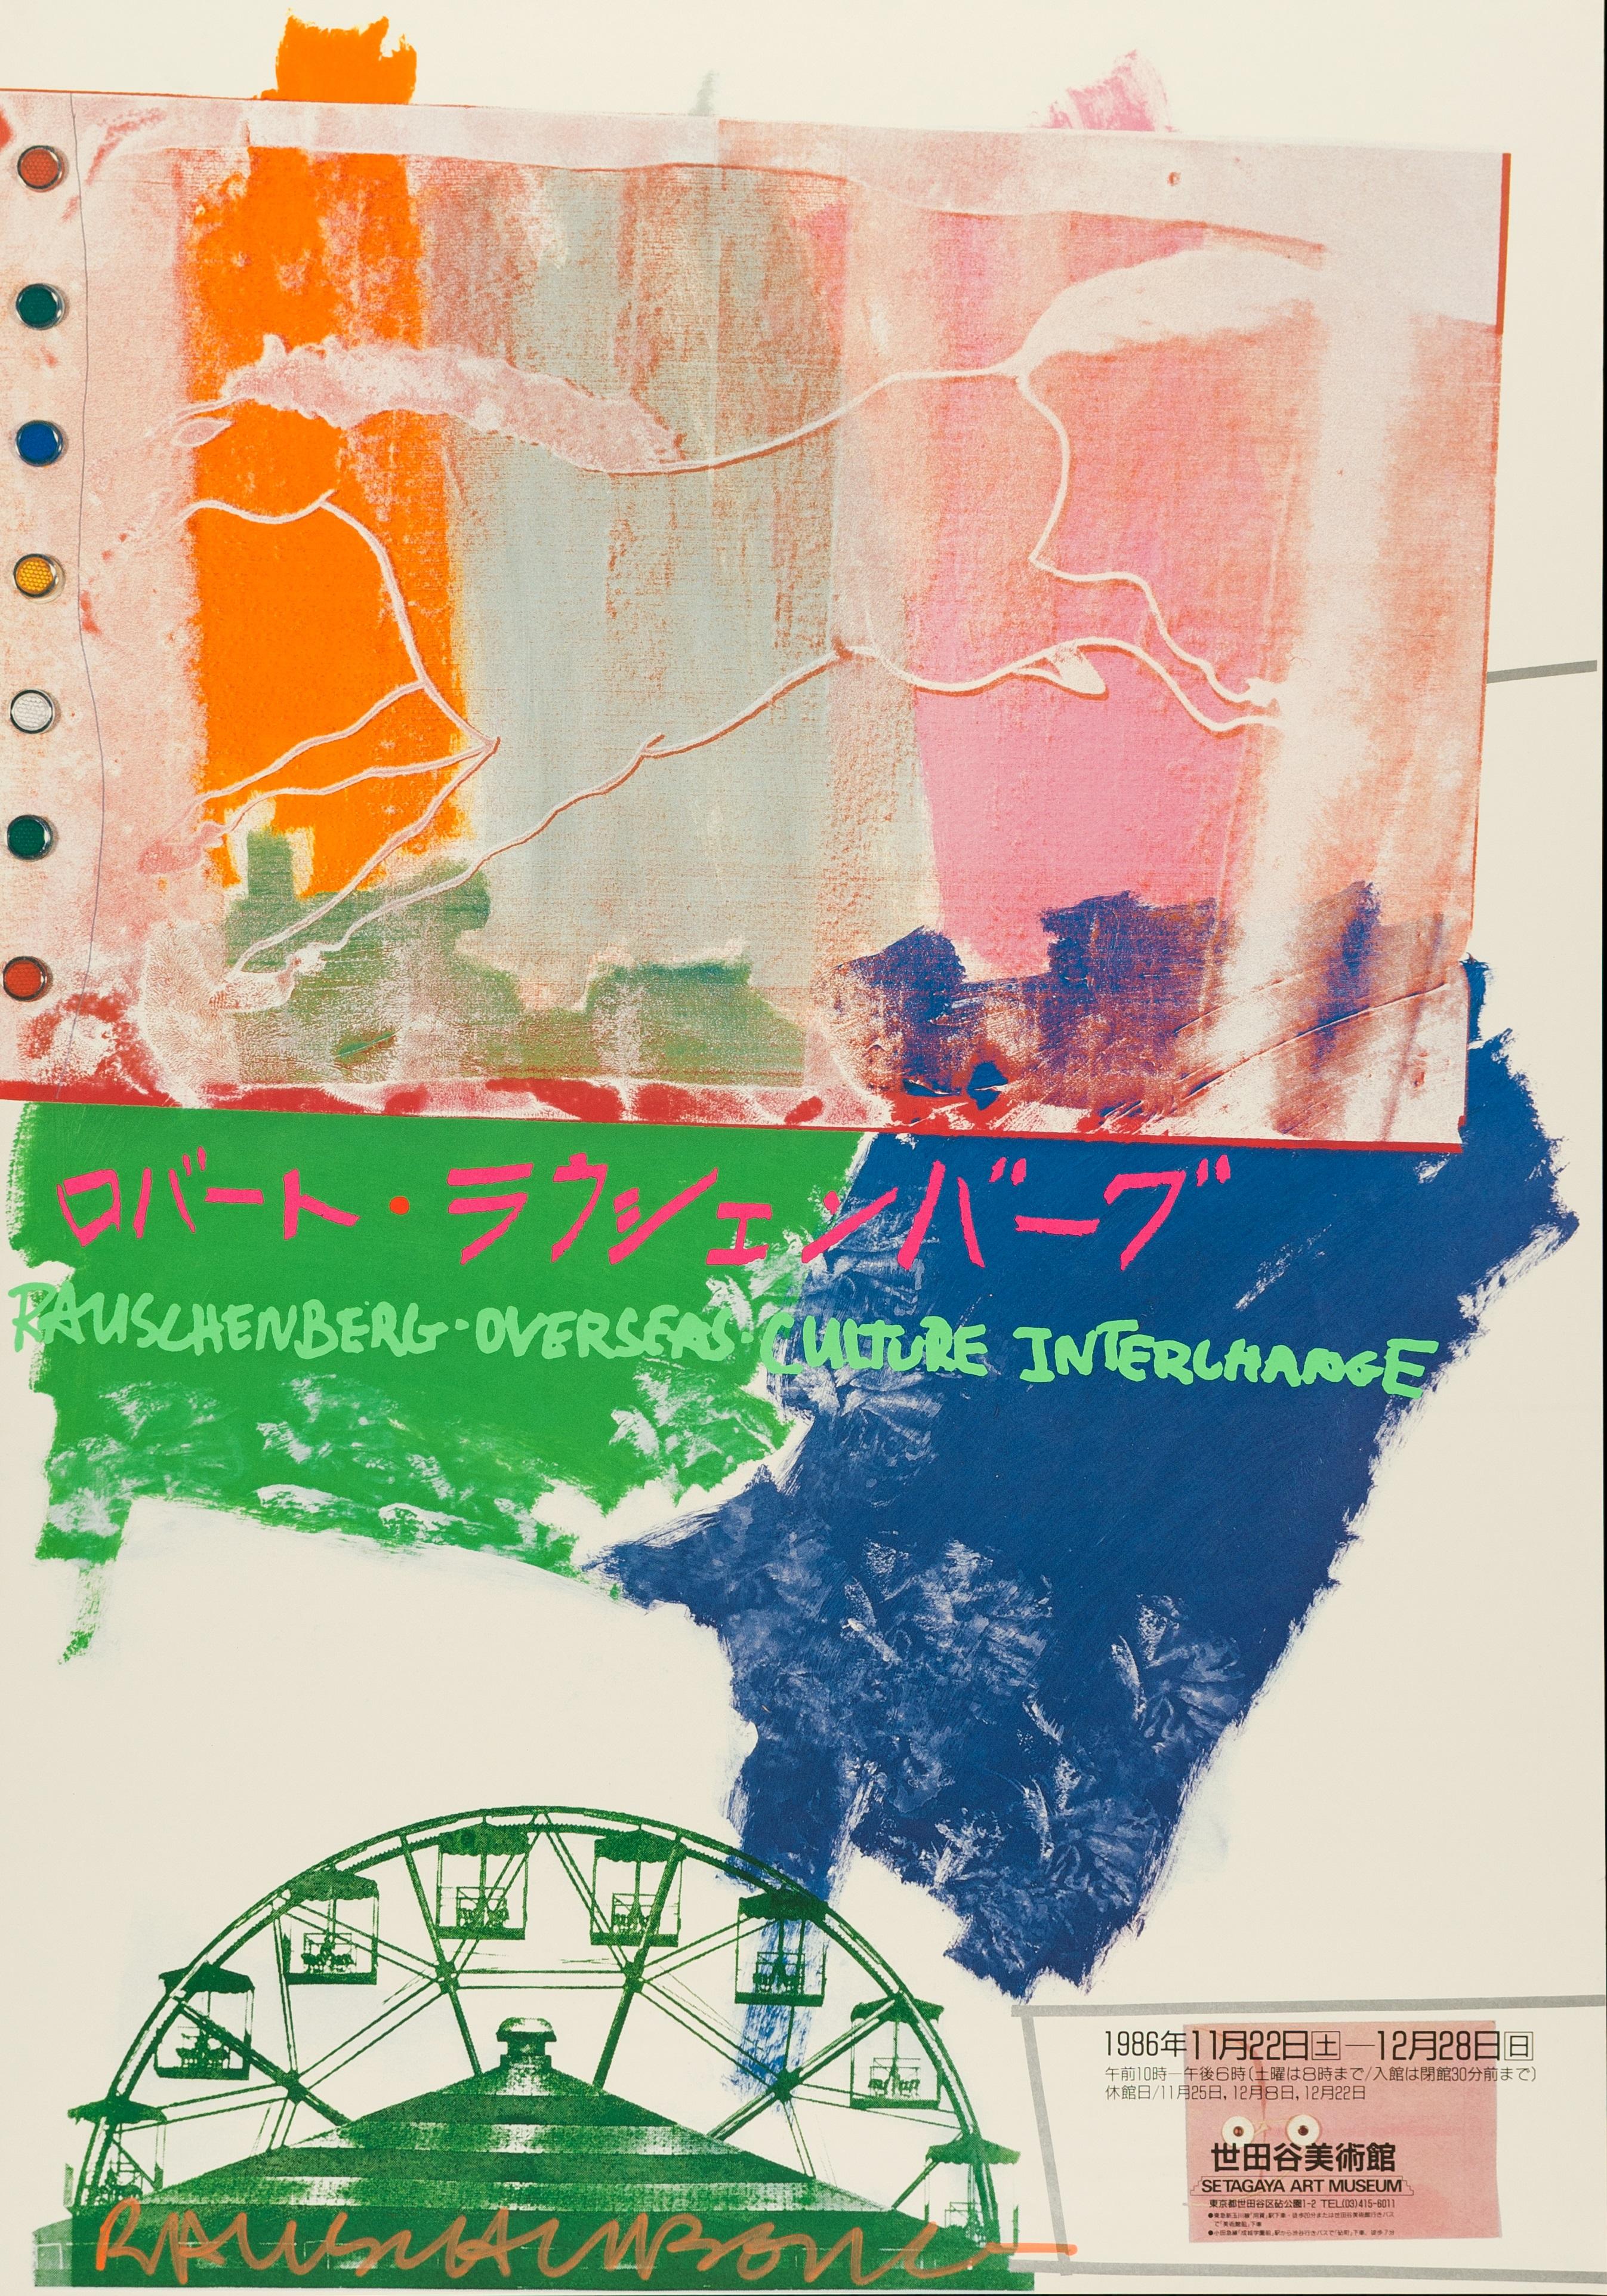 Robert Rauschenberg, Rauschenberg Overseas Culture Interchange, Setagaya Art Museum, Tokyo. Nov-Dec 1986, Offsetdruck, 87,8 x 61,2 cm, © Robert Rauschenberg Foundation / VG Bild-Kunst, Bonn 2017